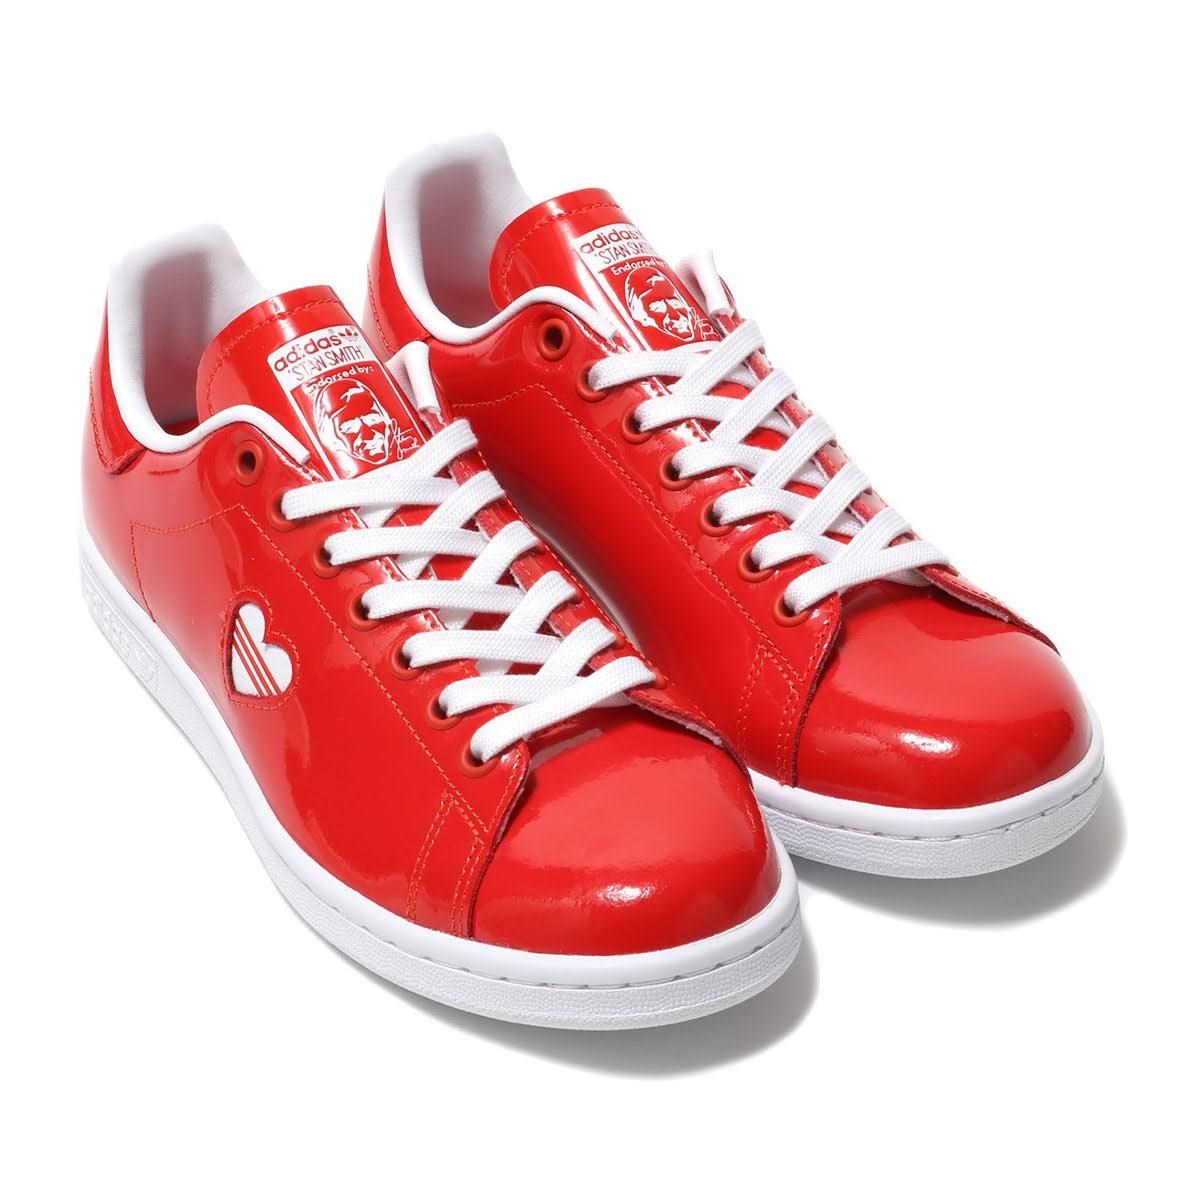 adidas Originals STAN SMITH W(アディダスオリジナルス スタンスミス W)ACTIVE RED/RUNNING WHITE/ACTIVE RED【メンズ レディース スニーカー】19SS-I